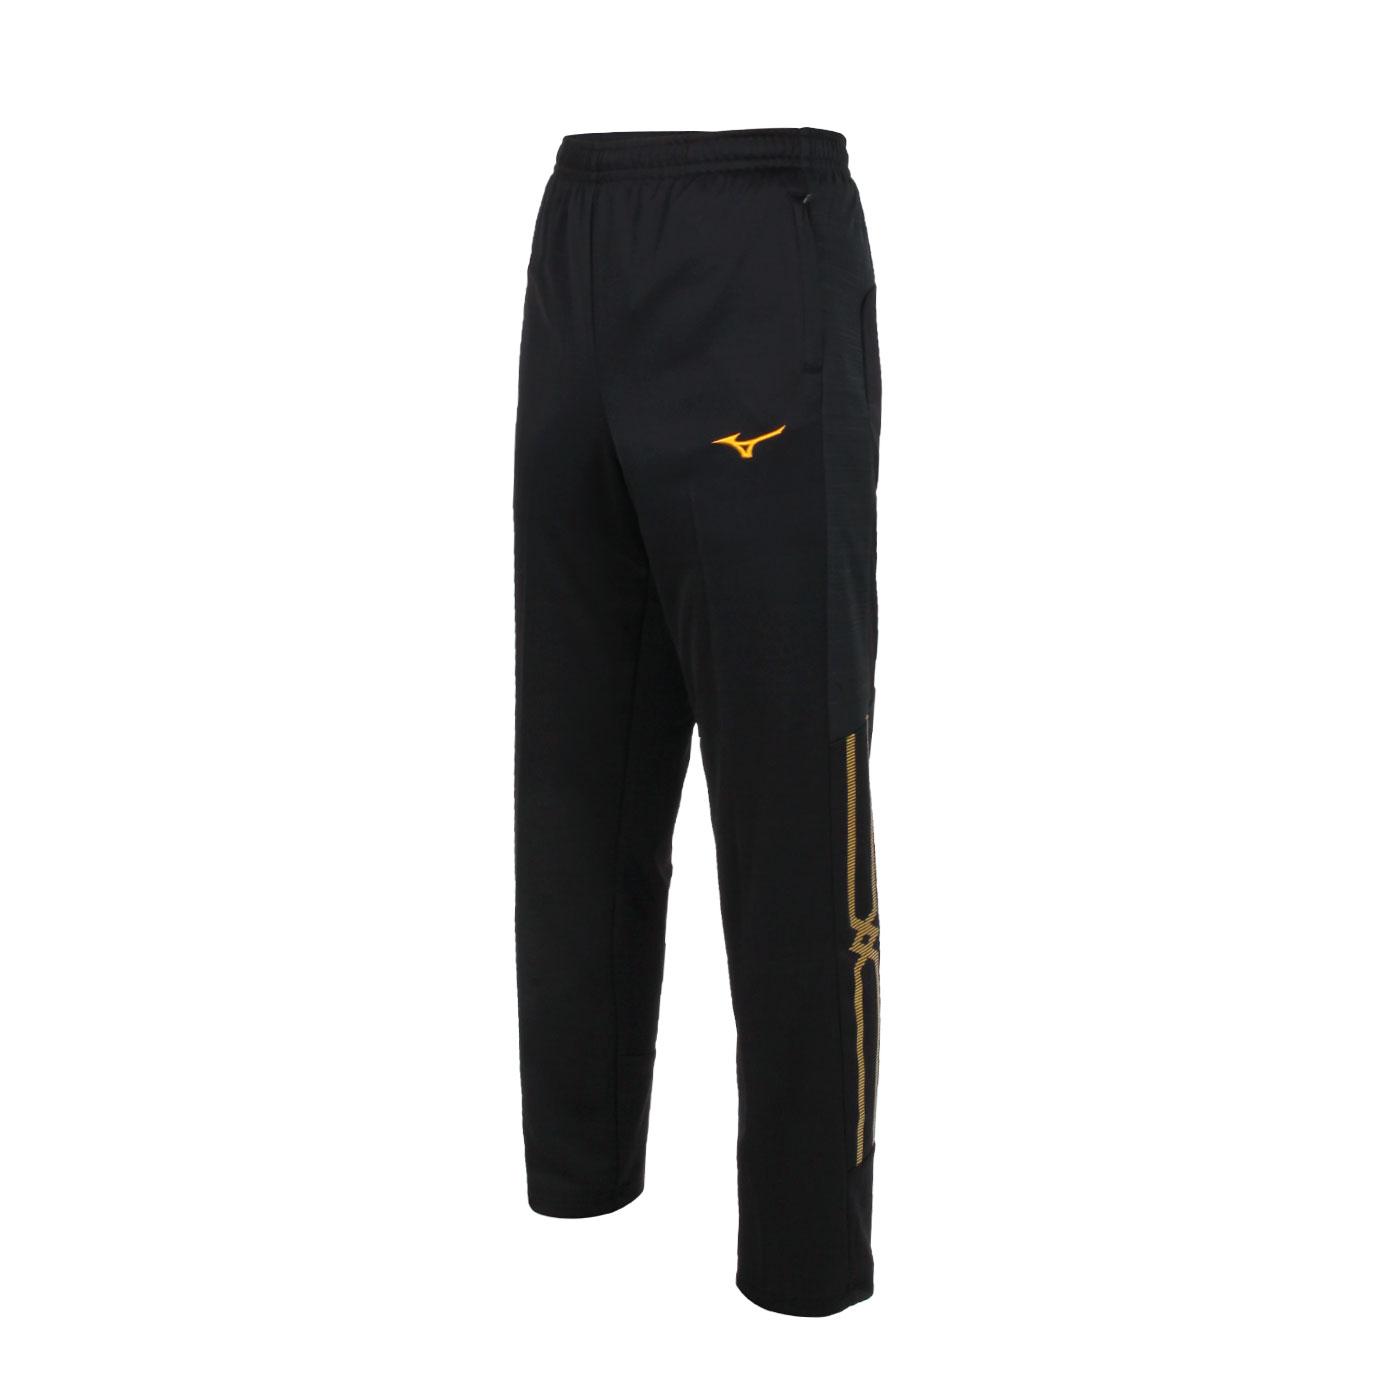 MIZUNO 男款針織長褲 32TD153399 - 黑黃